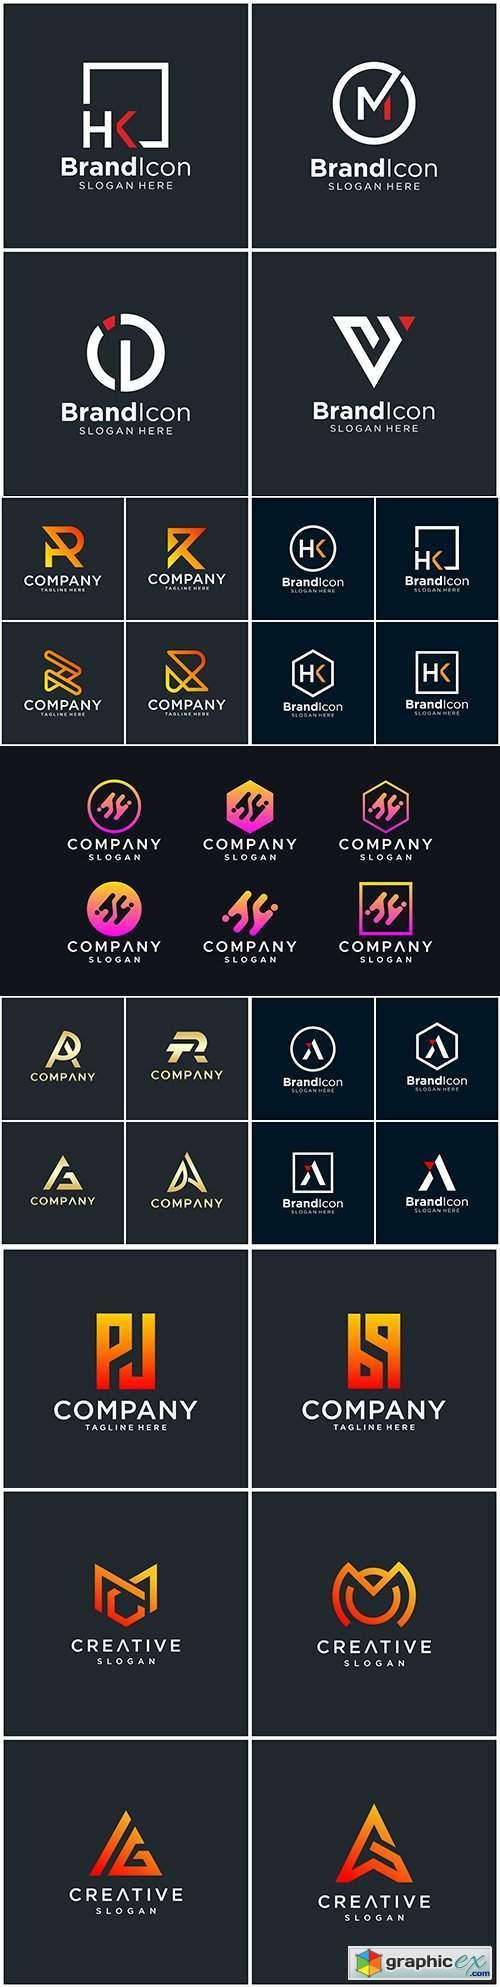 Brand name company logos business corporate design 40